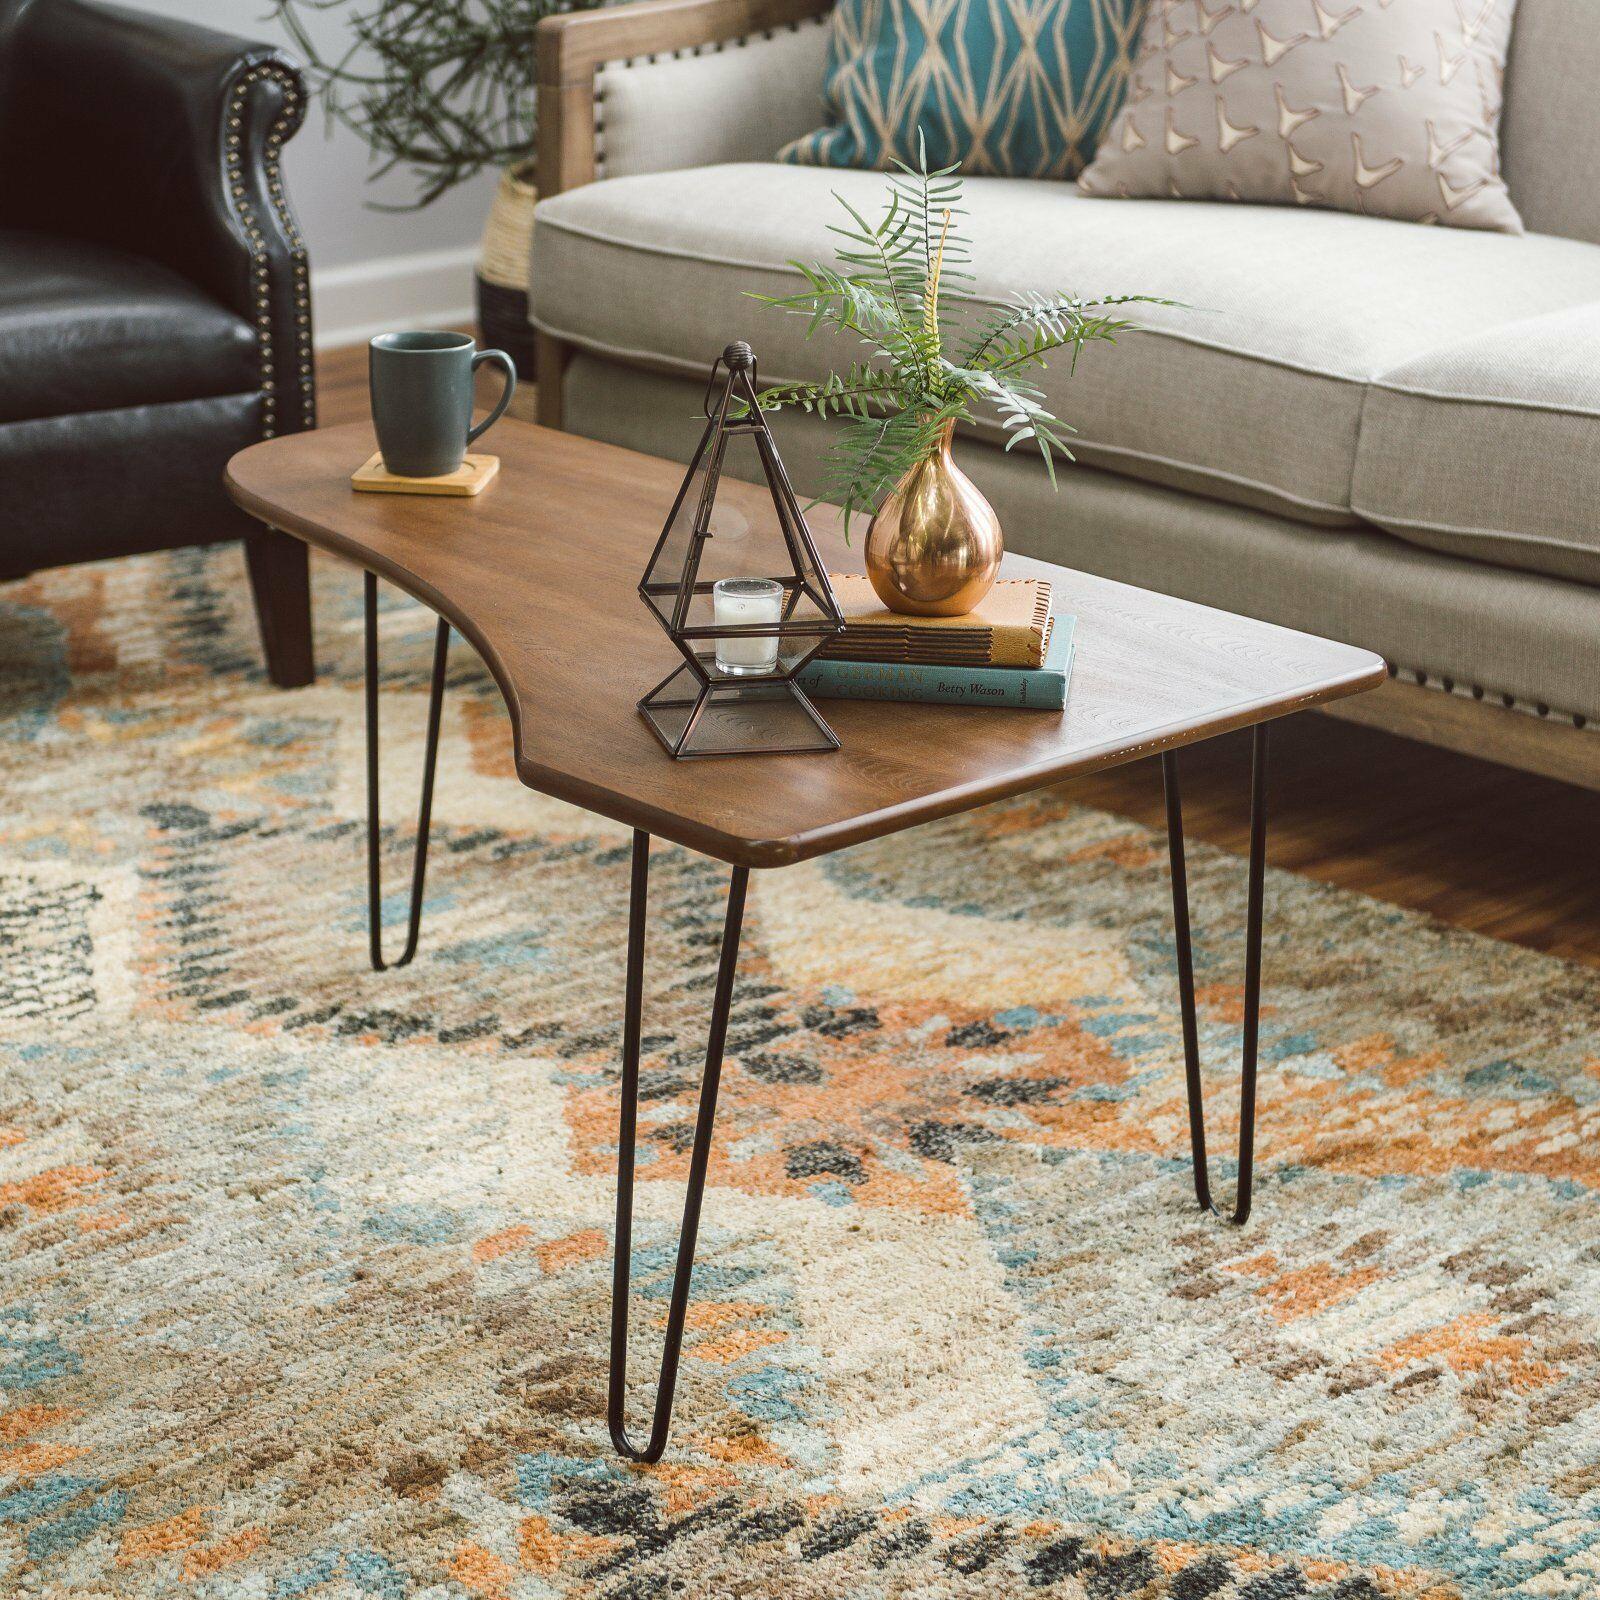 Walnut Finish Wood Metal Mid Century Modern Coffee Table